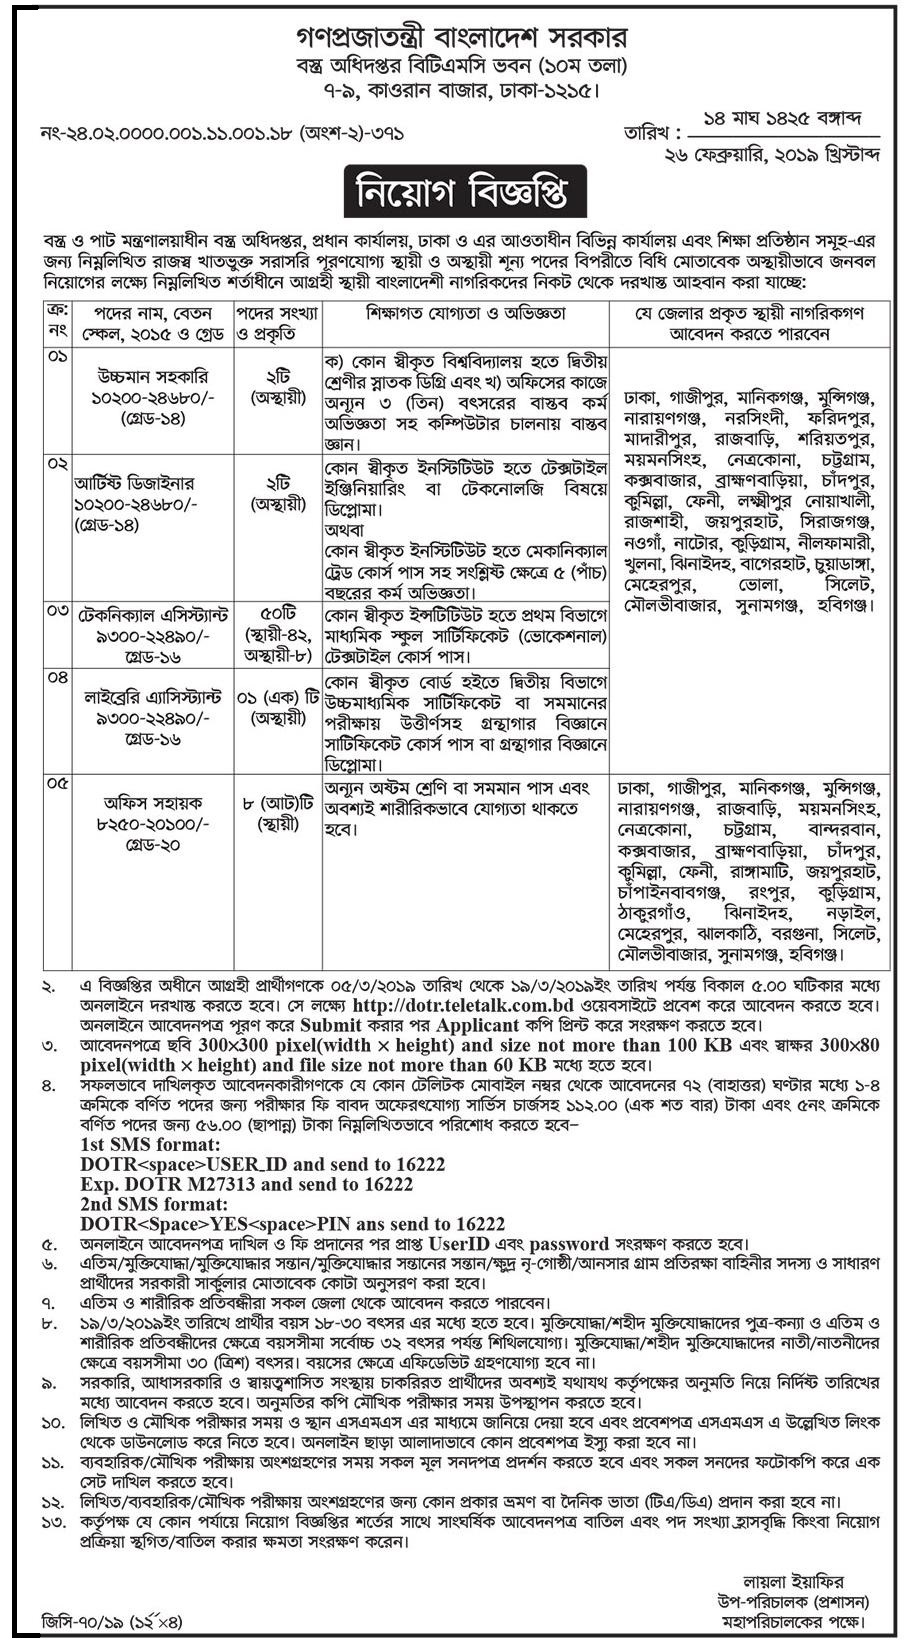 Directorate of Textile and Jute Ministry Job Circular 2019